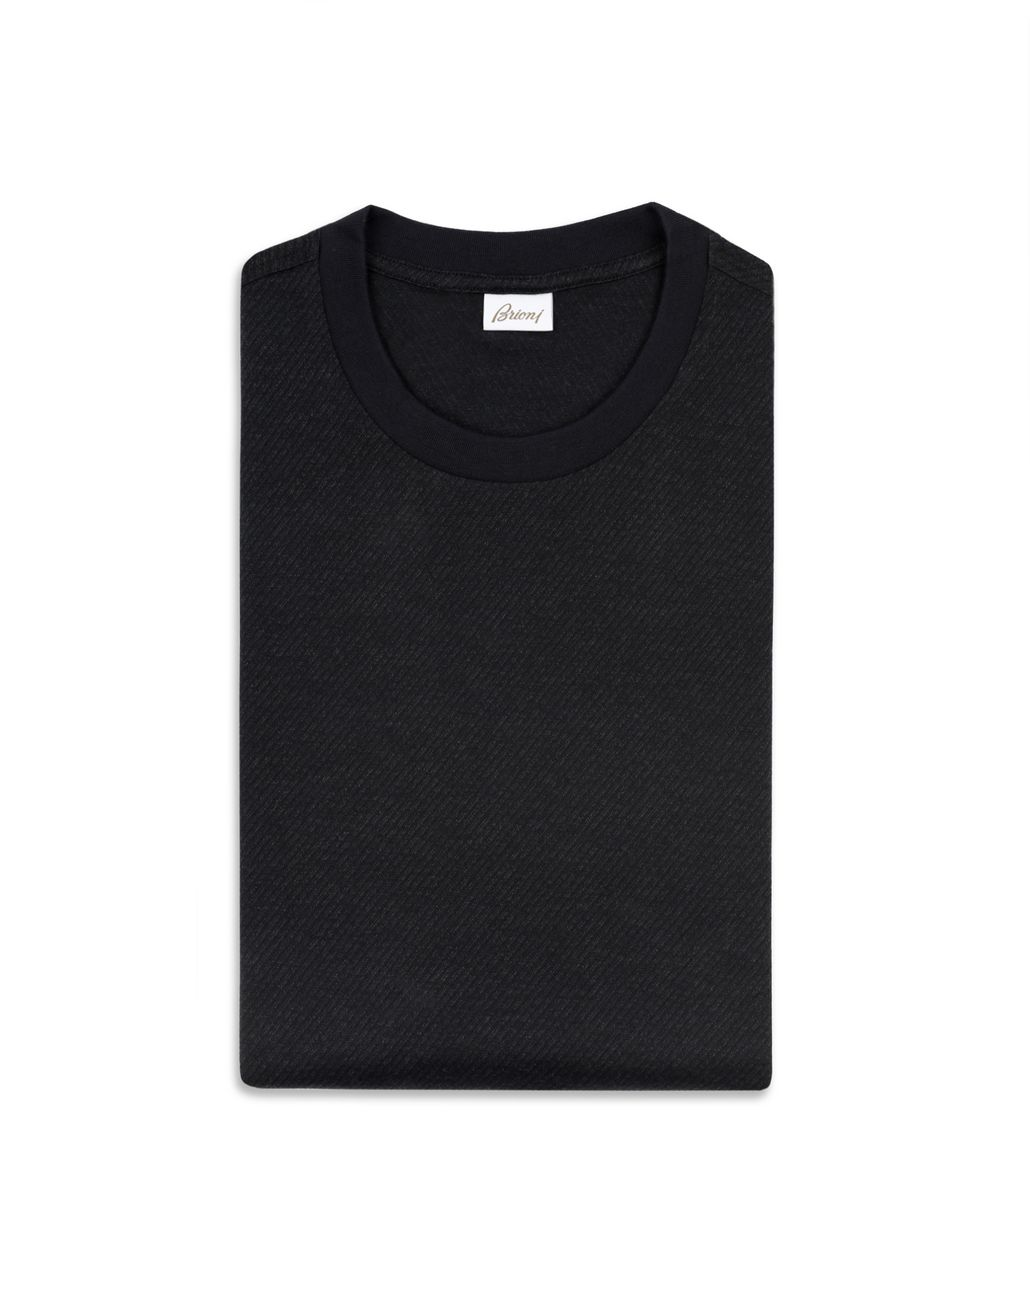 BRIONI Navy Blue Jacquard T-Shirt T-Shirts & Polos [*** pickupInStoreShippingNotGuaranteed_info ***] e